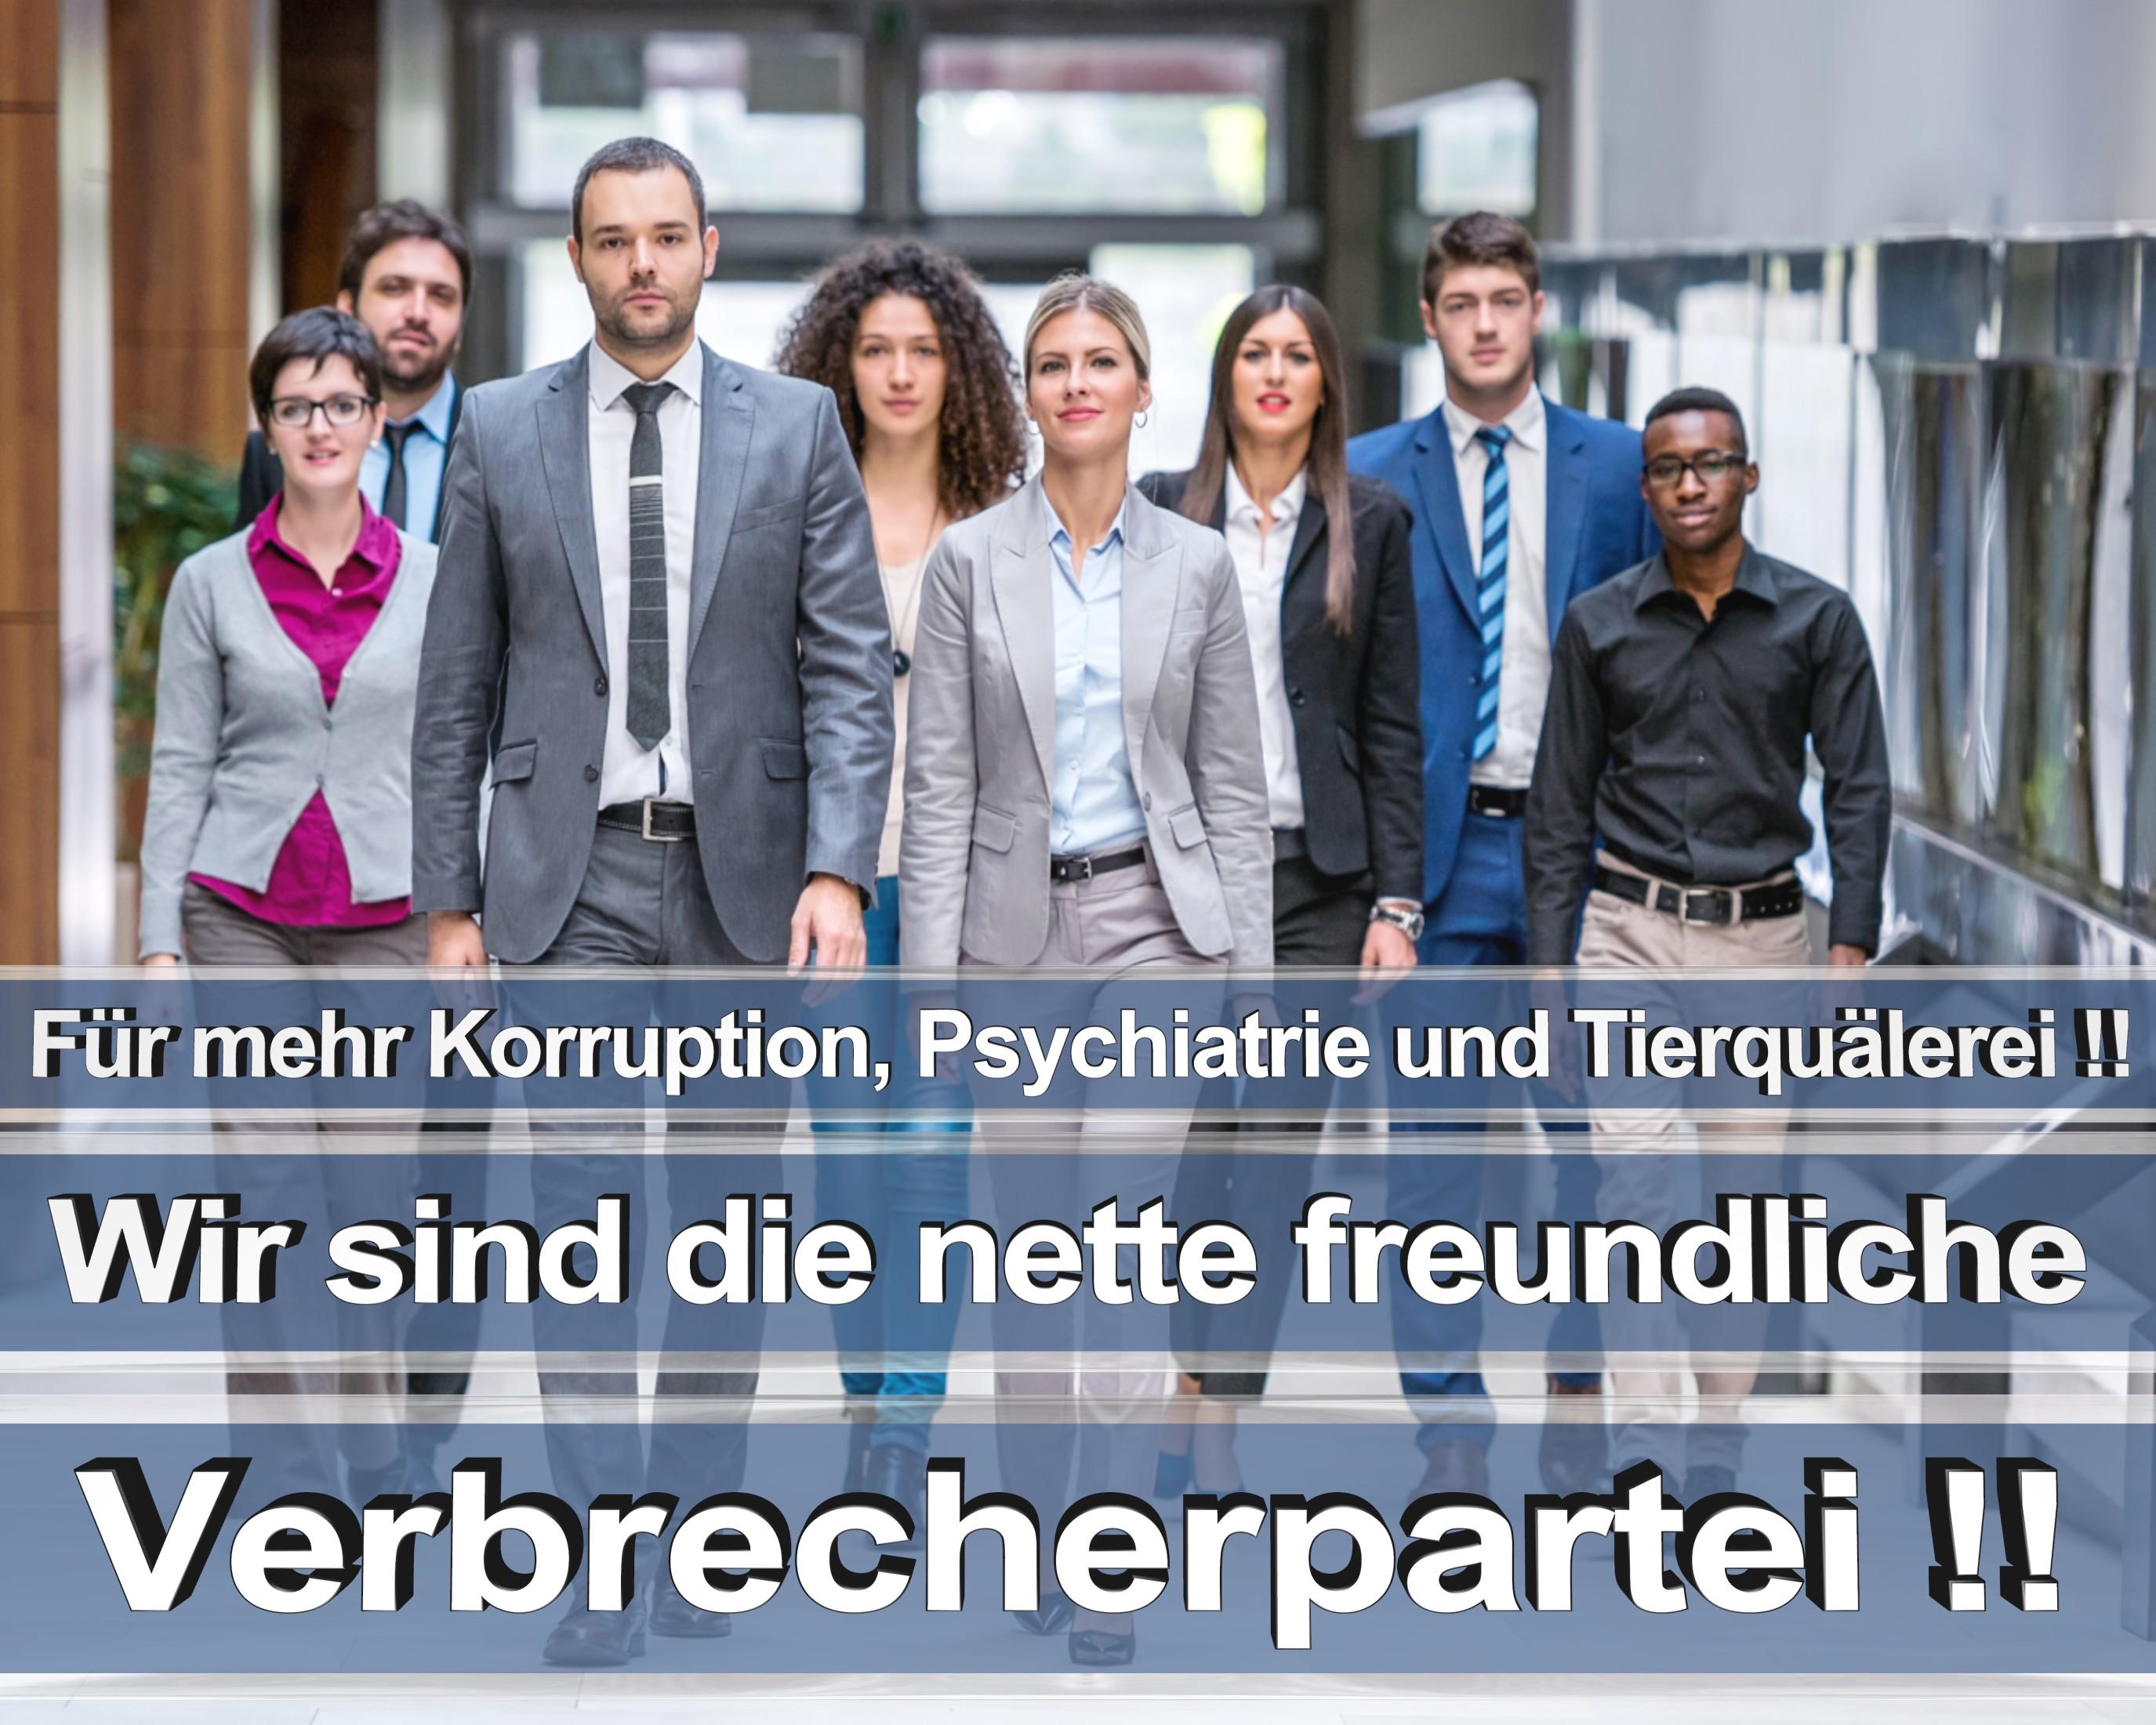 FDP Bielefeld Jan Maik Schlifter, Jasmin Wahl Schwentker, Jens Andernacht, Laura Schubert, Dr Klaus Schleicher, Rainer Seifert (12)